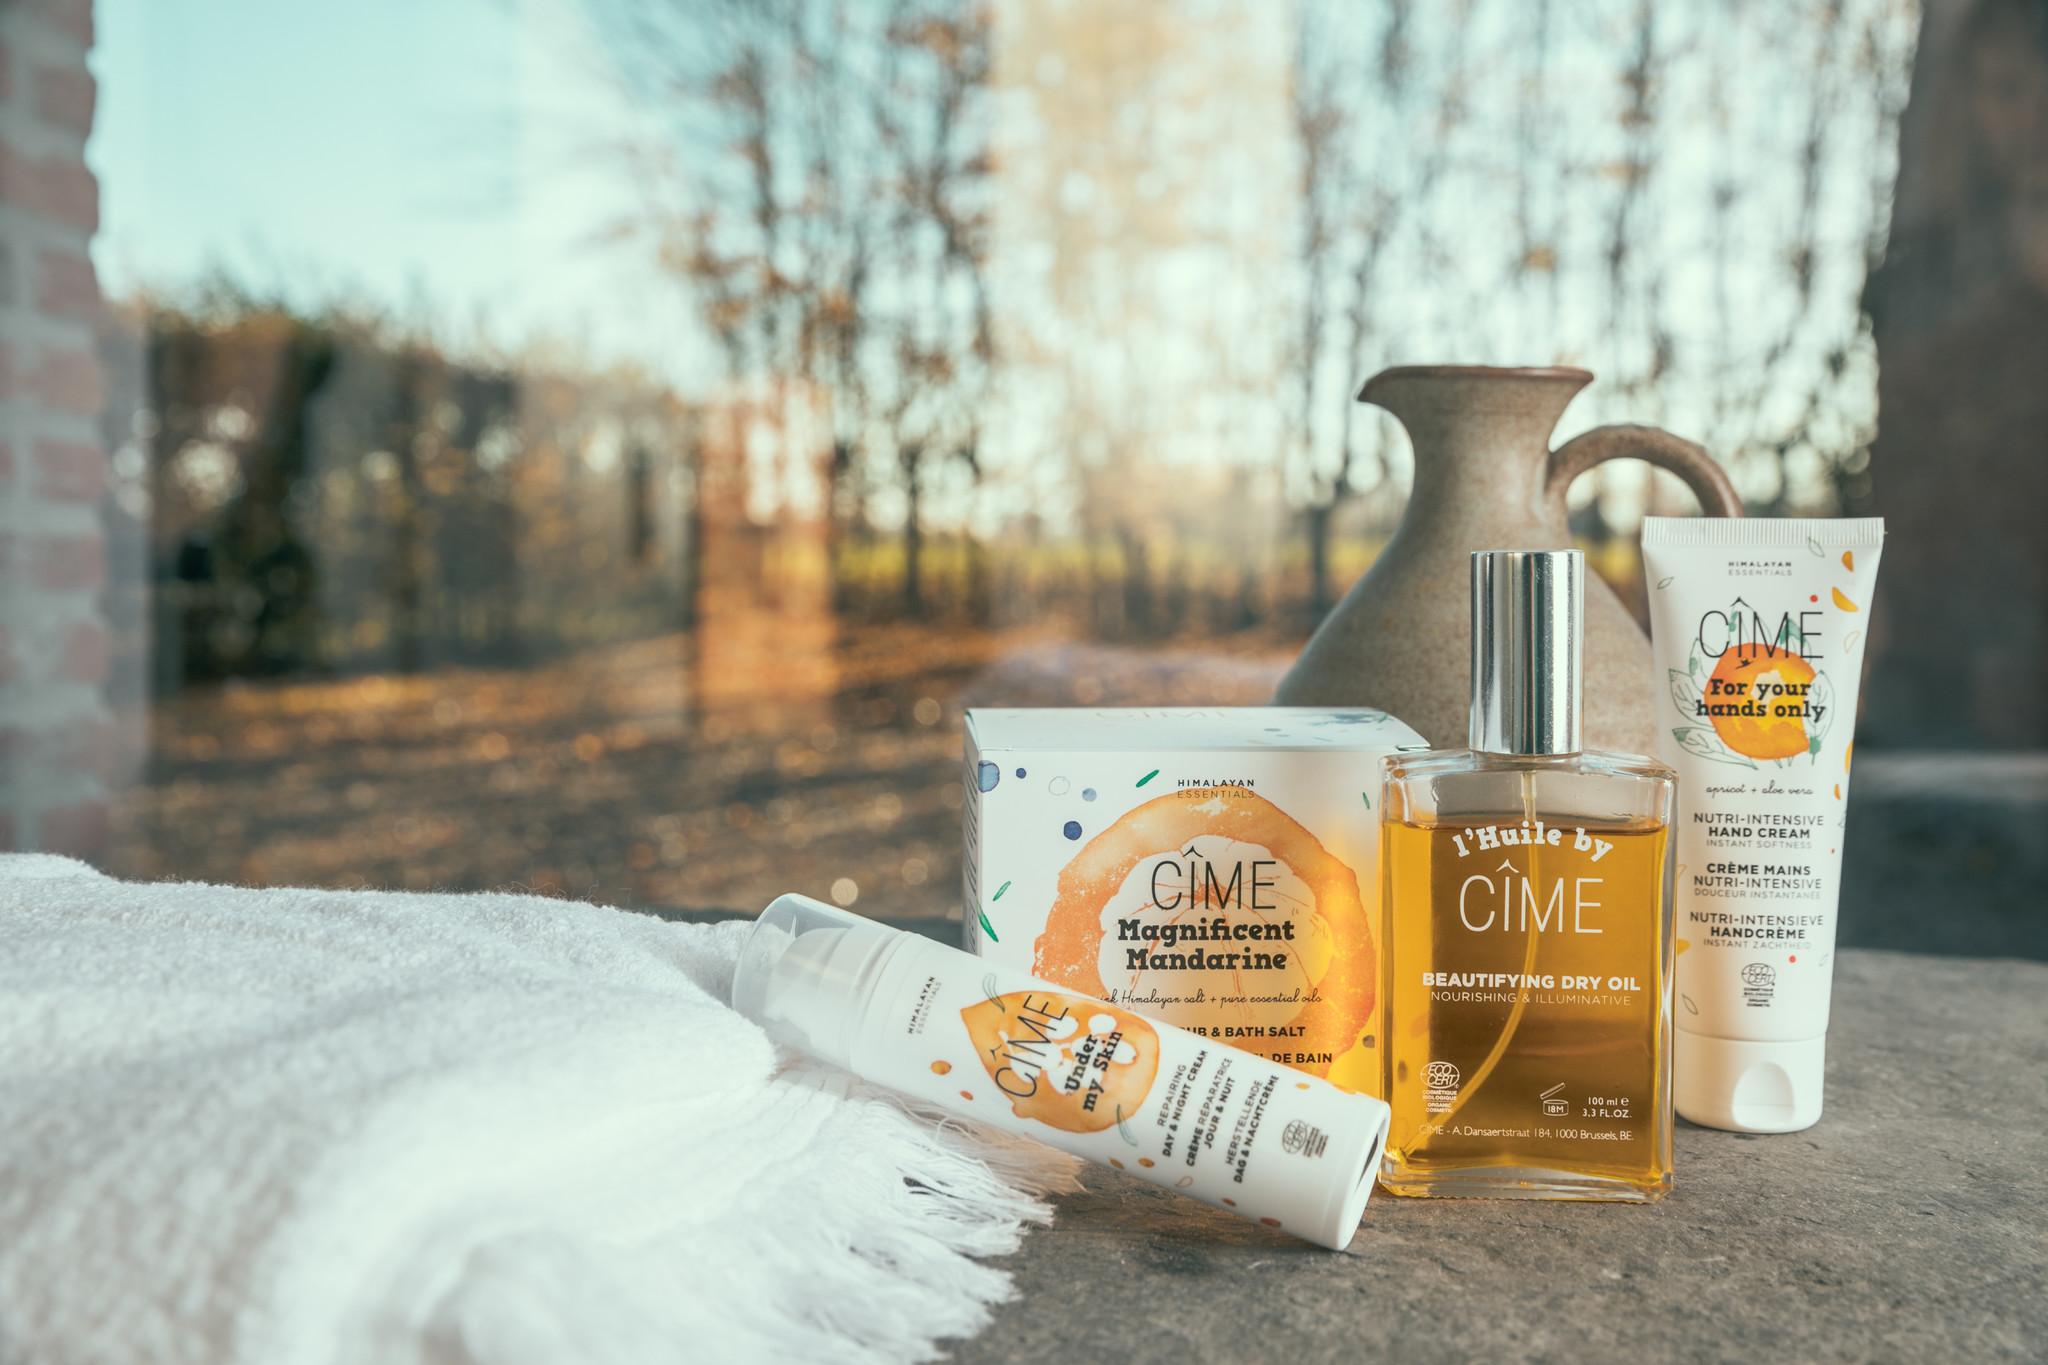 Multifunctionele droge olie - l'Huile by Cîme - Cîme